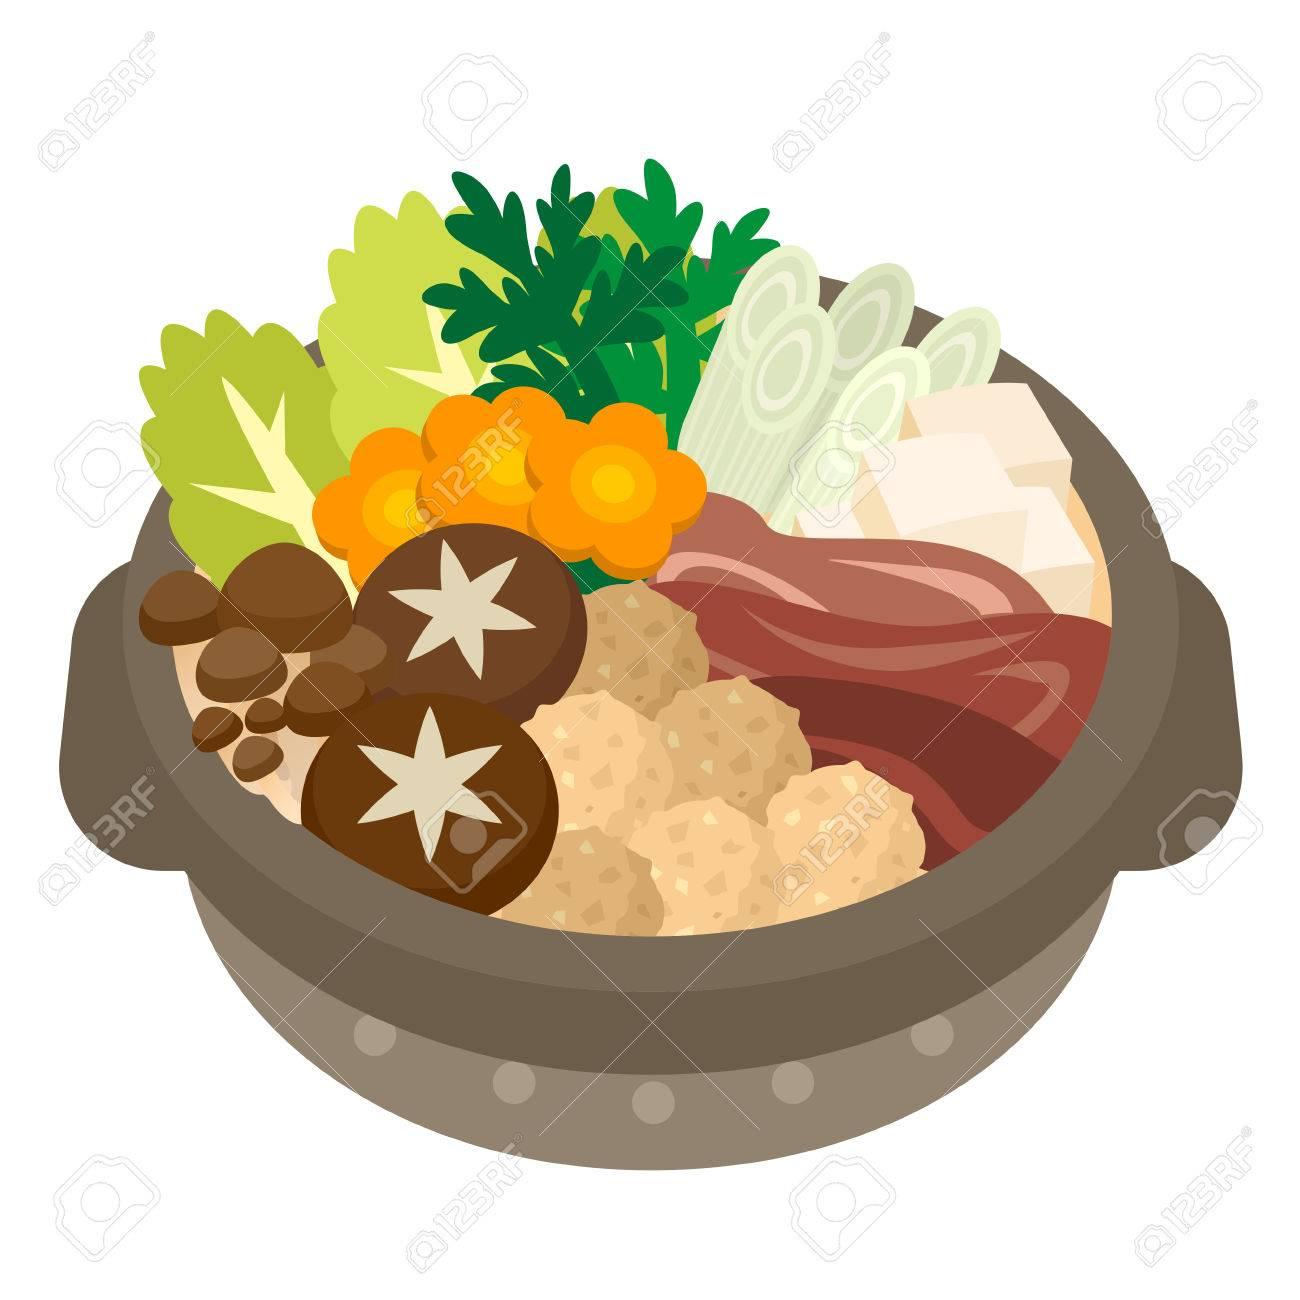 Illustration of casserole - 70071926